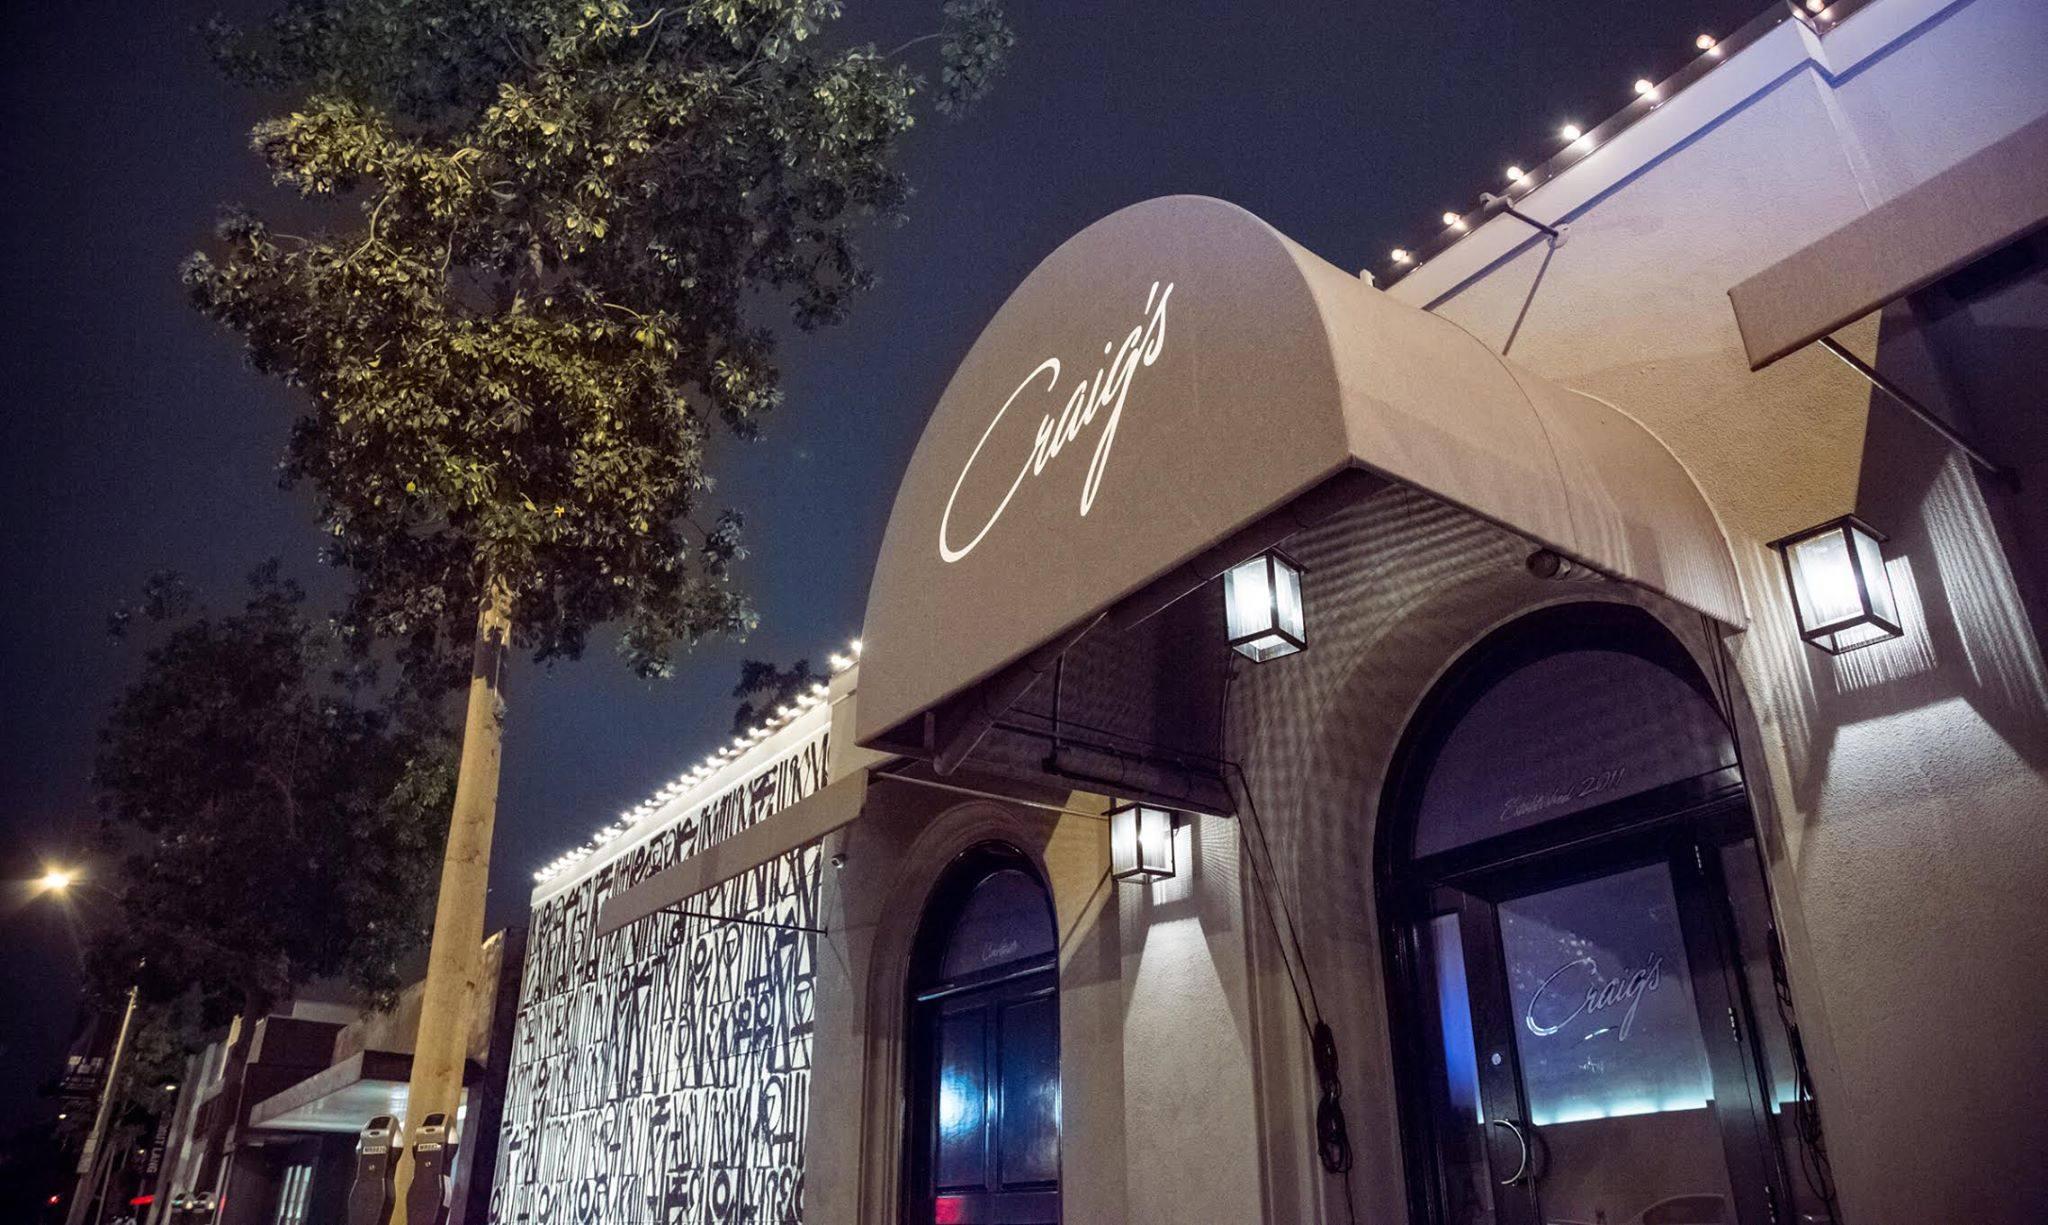 Craig's Restaurant in West Hollywood